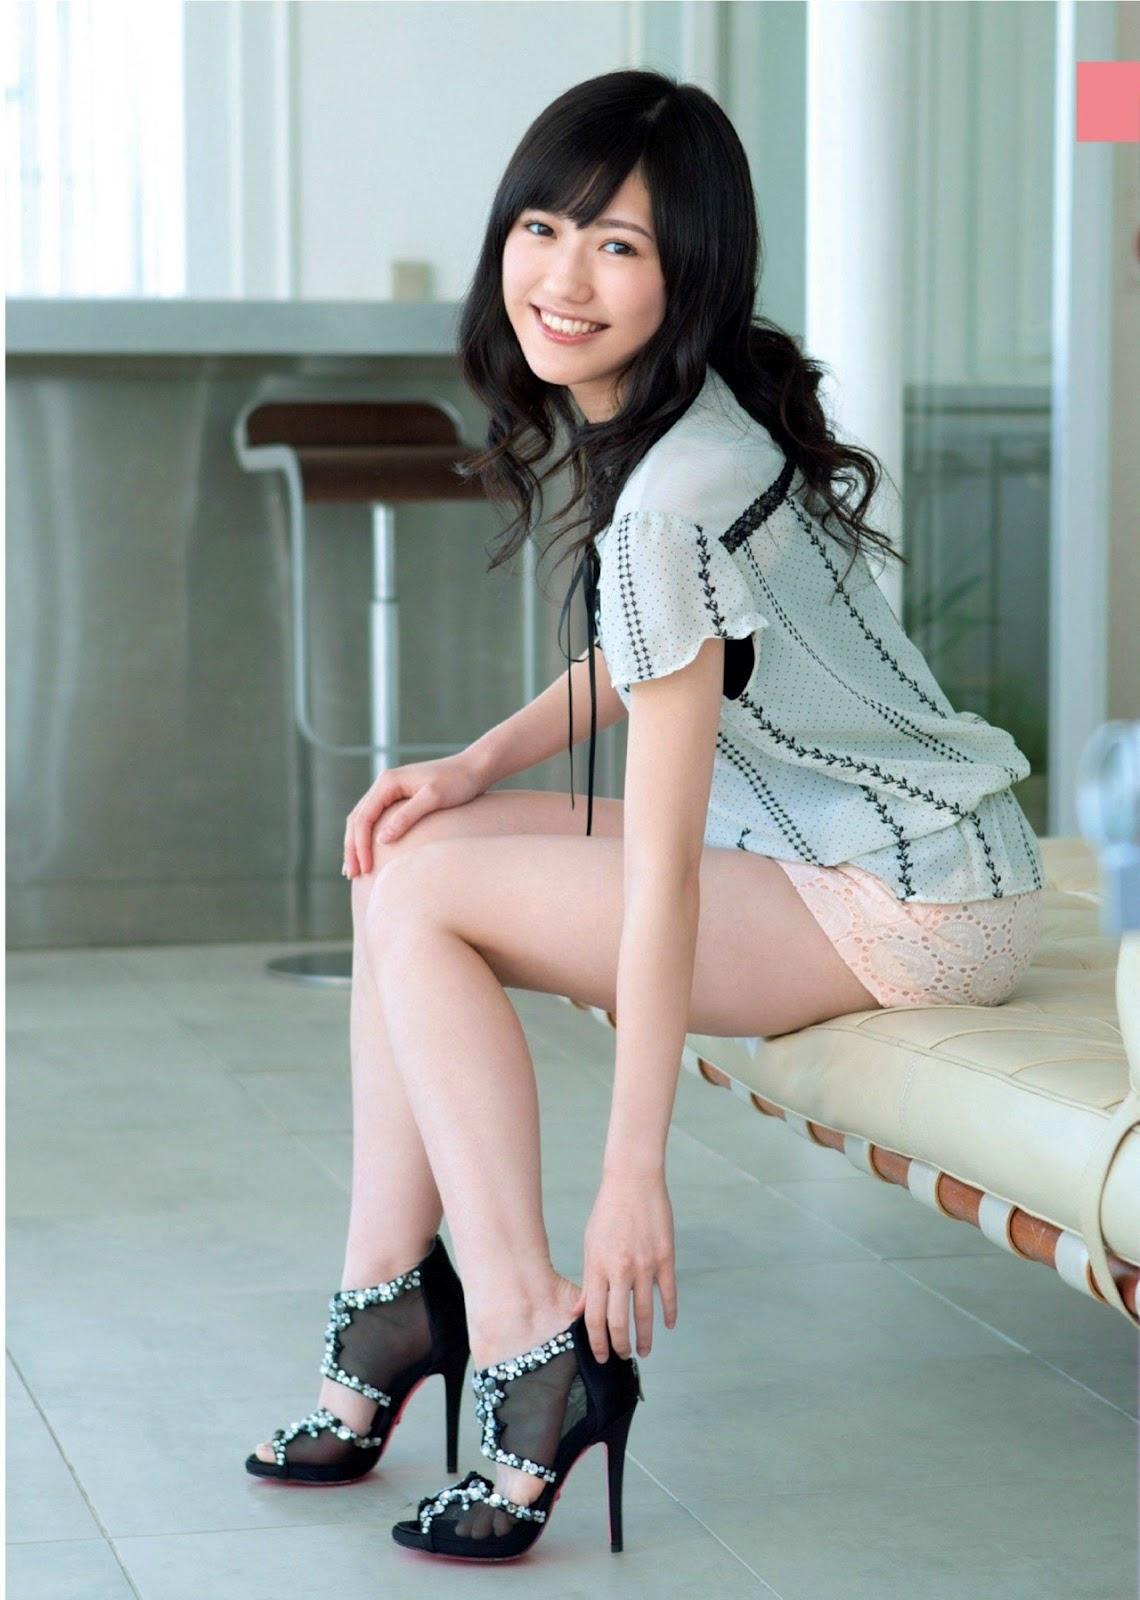 Фото japanese lady cuckold 25 фотография